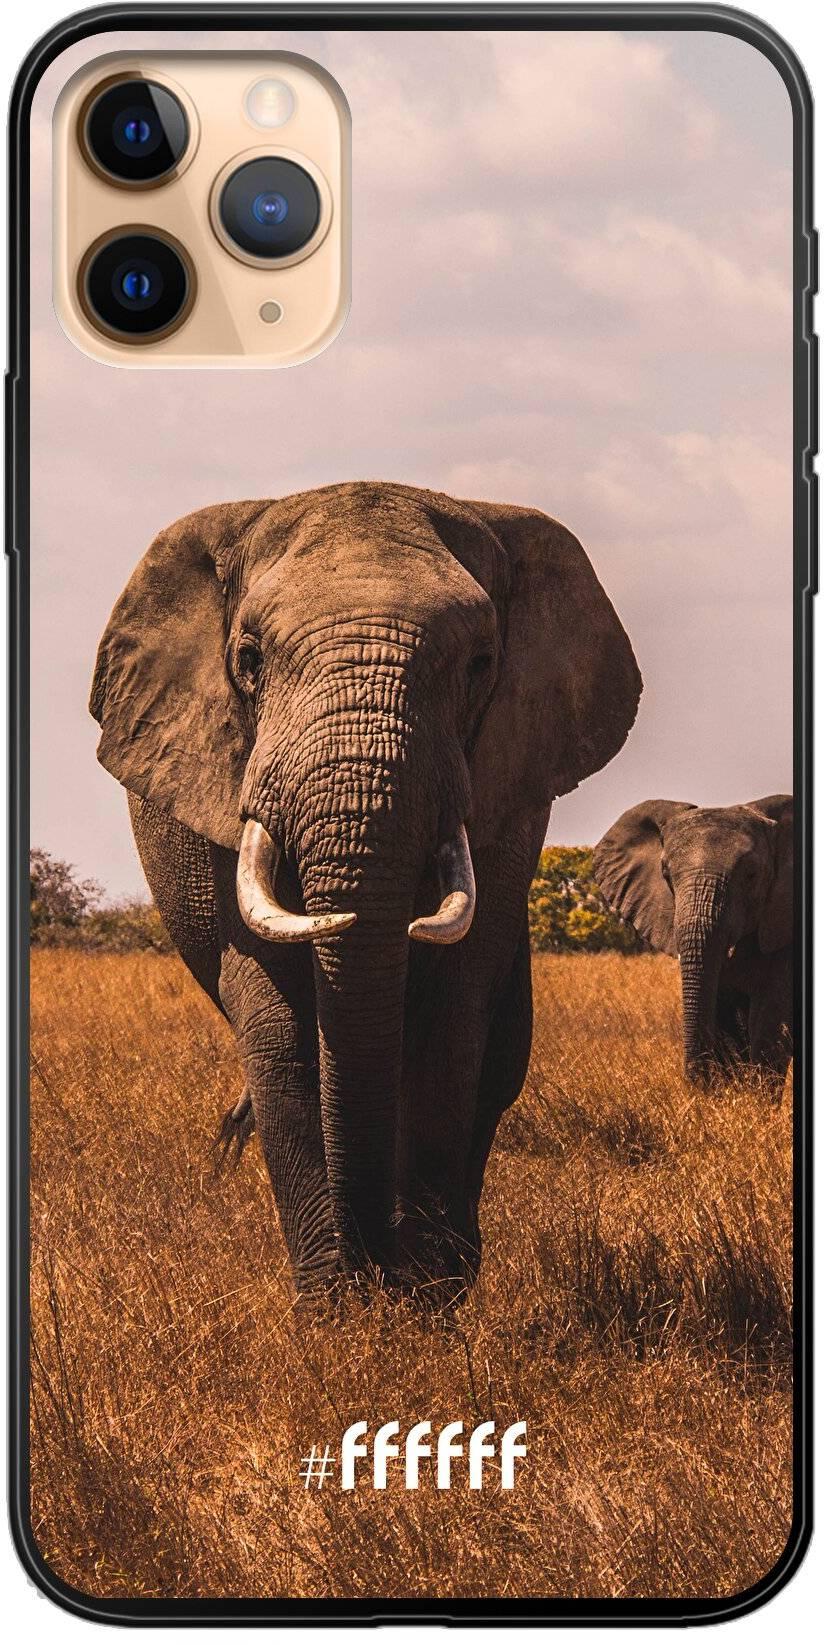 Elephants iPhone 11 Pro Max